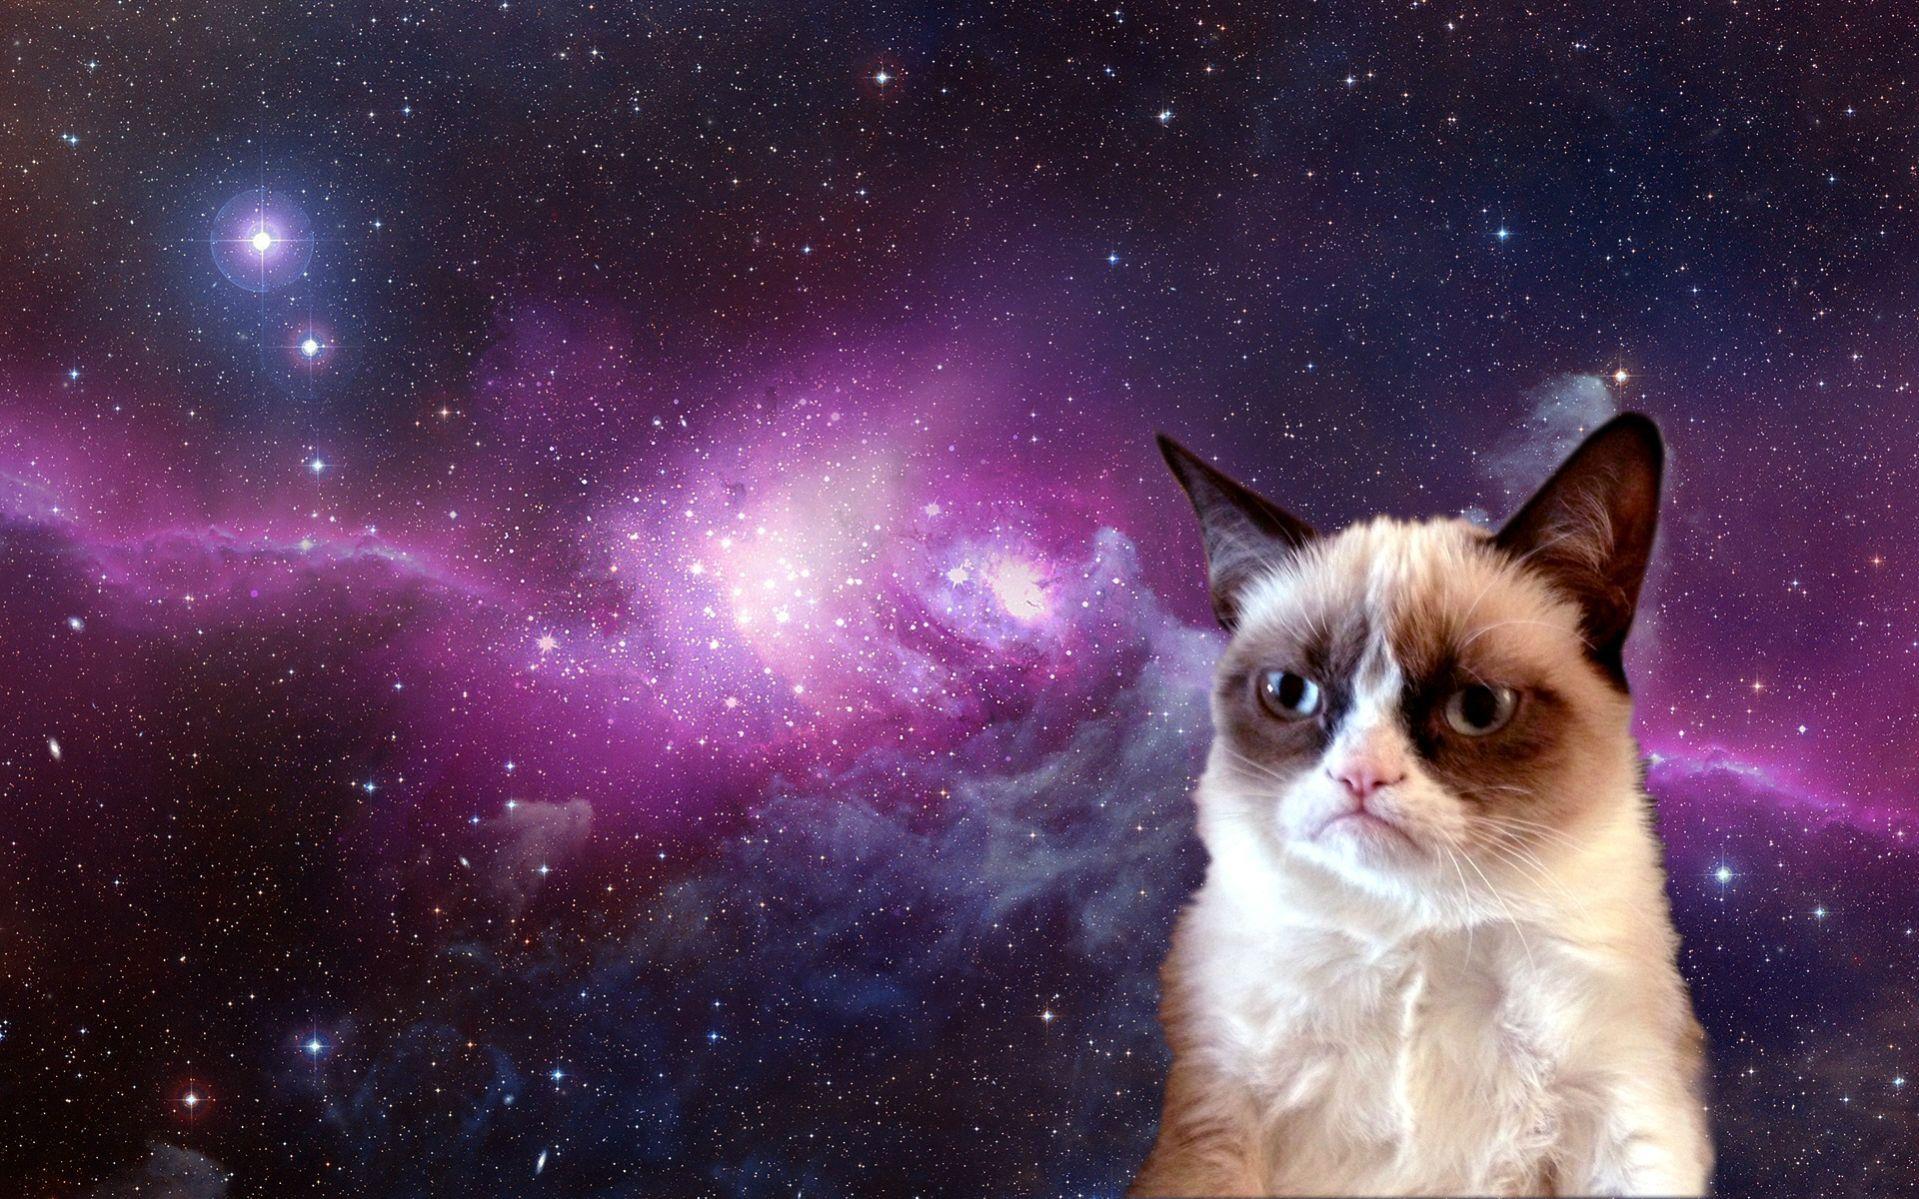 Grumpy Cat in Space [1920x1200] Grumpy cat humor, Cat